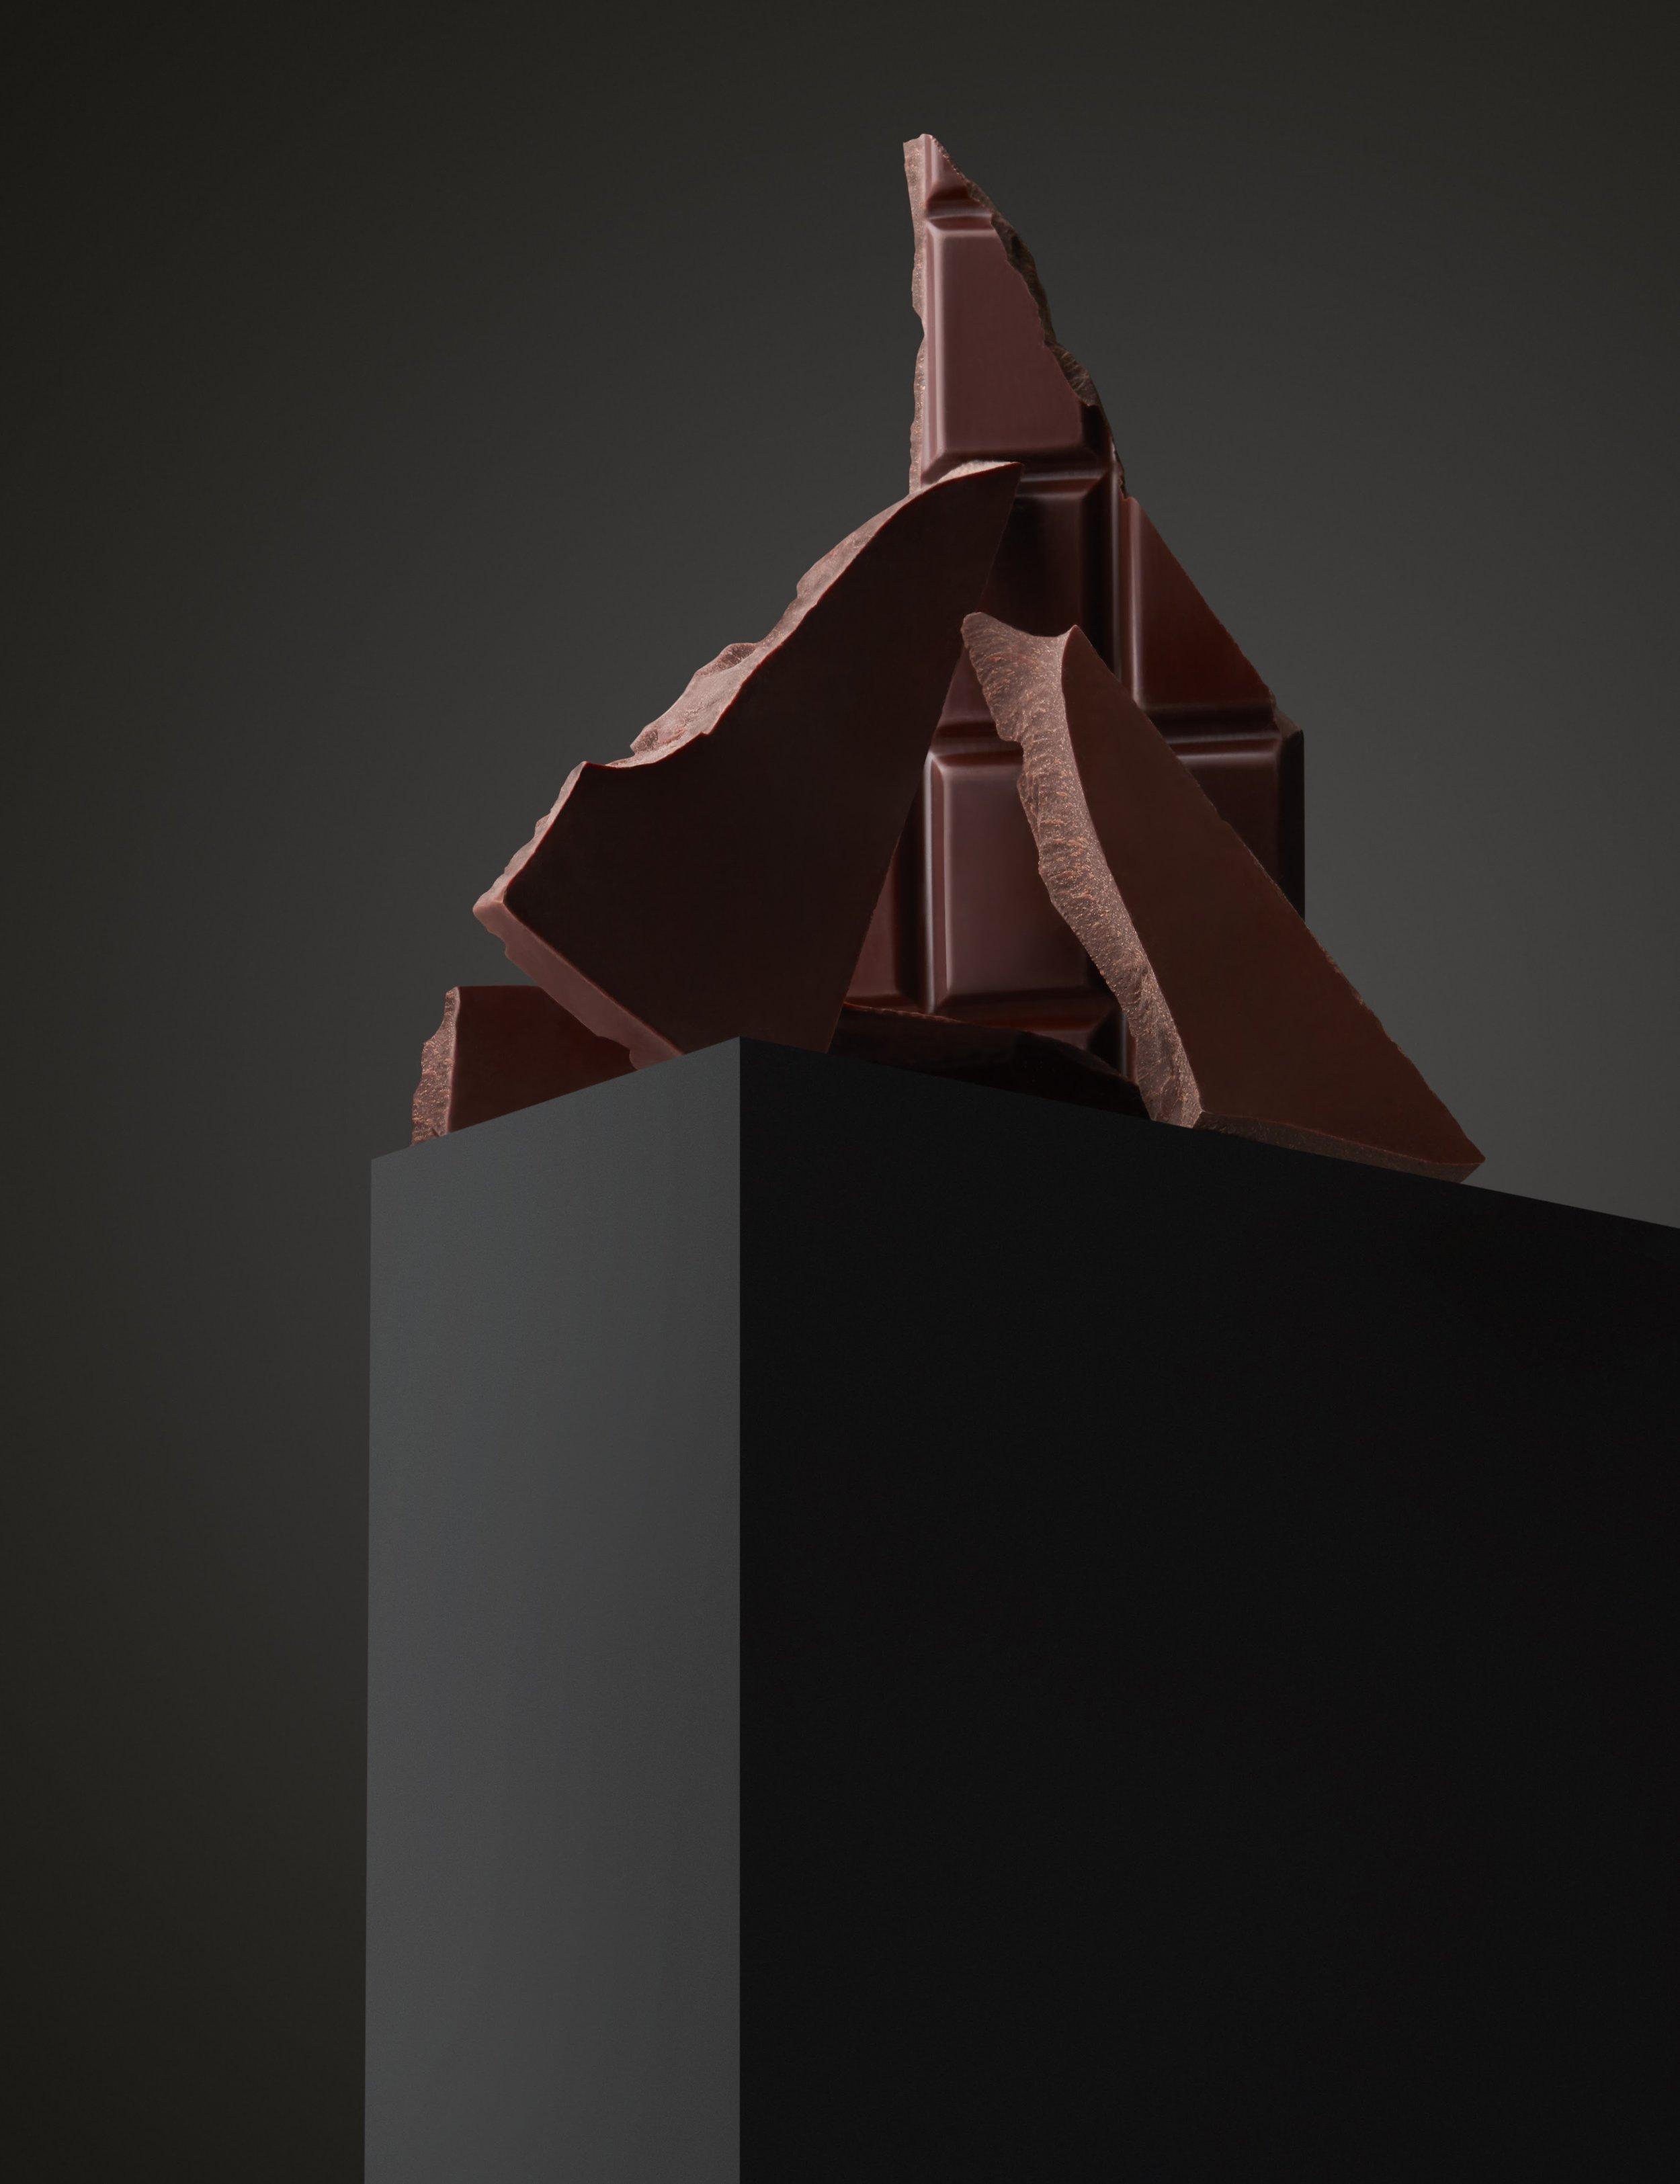 Zuki_Turner_Creative Direction_chocolate-architecture-still-life-photography-4.jpg